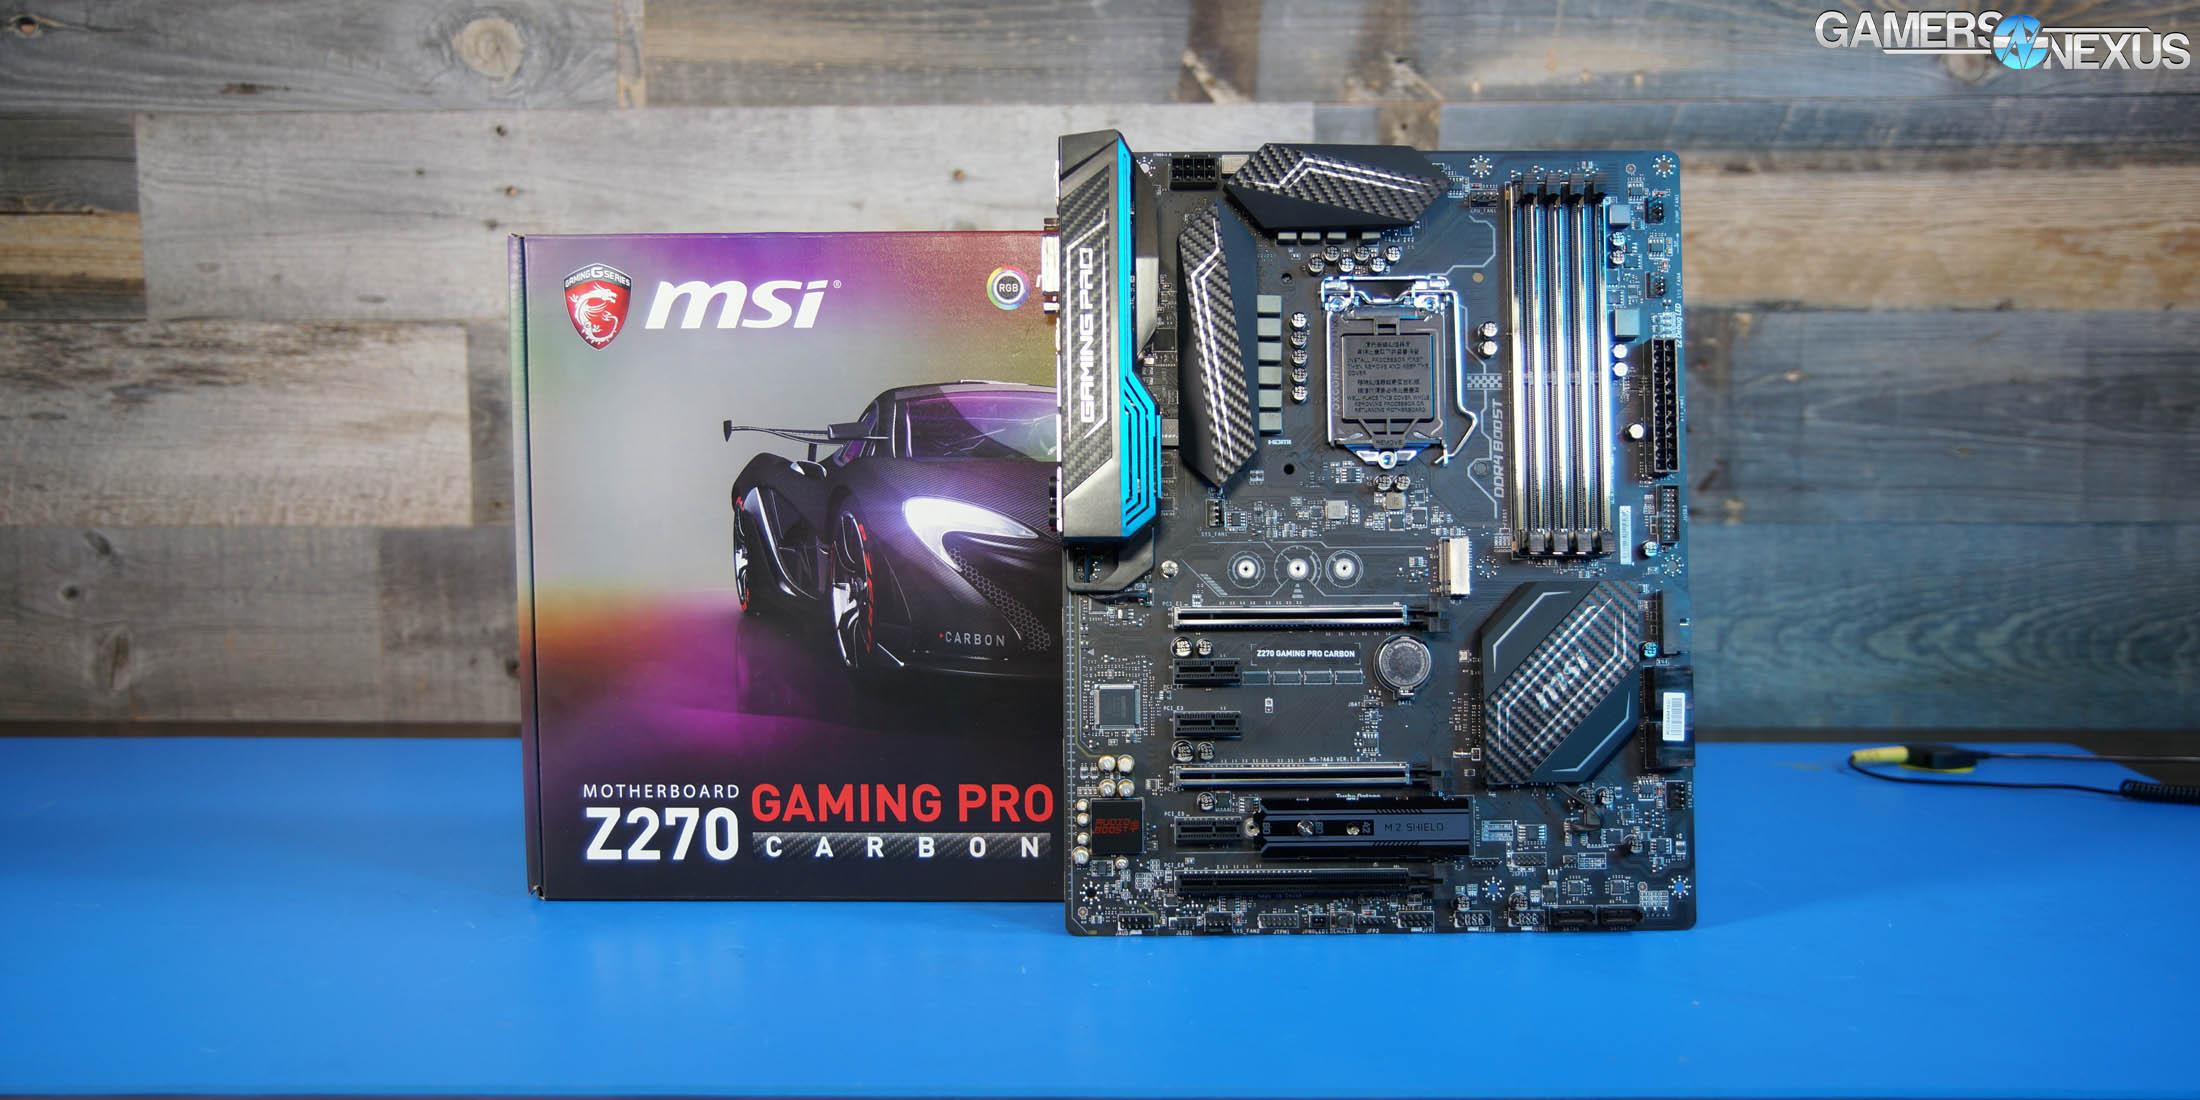 Intel i7-7700K Review: Gaming, Rendering, Temps, \u0026 Overclocking